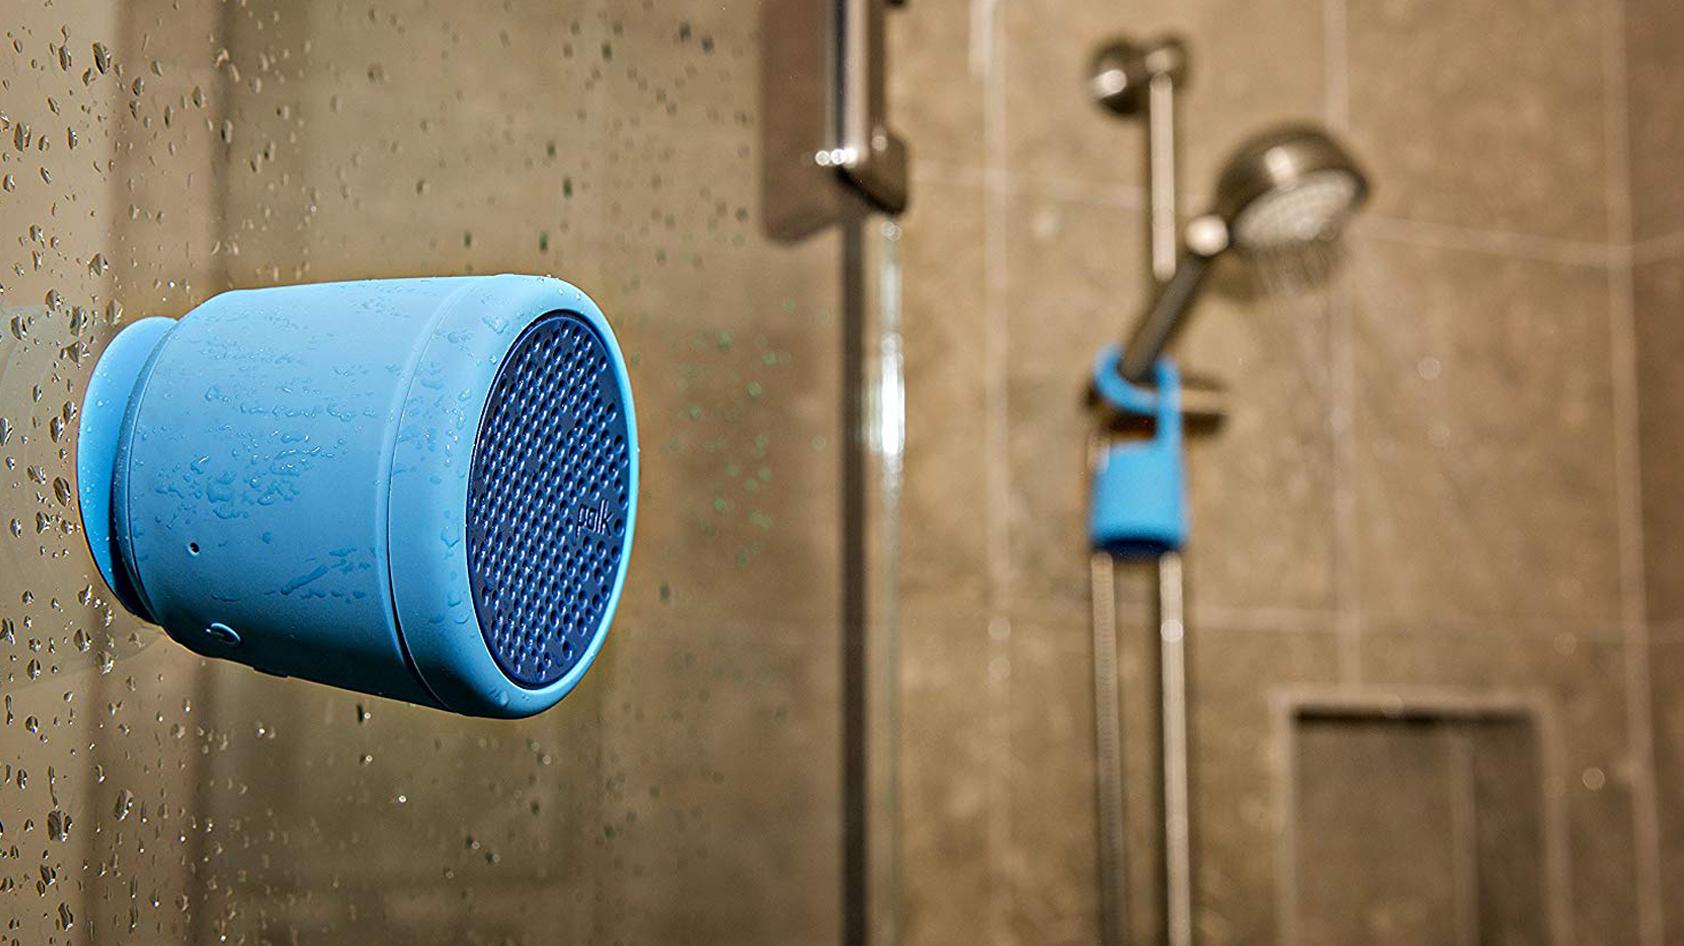 Best shower speakers: Sing it loud and sing it proud